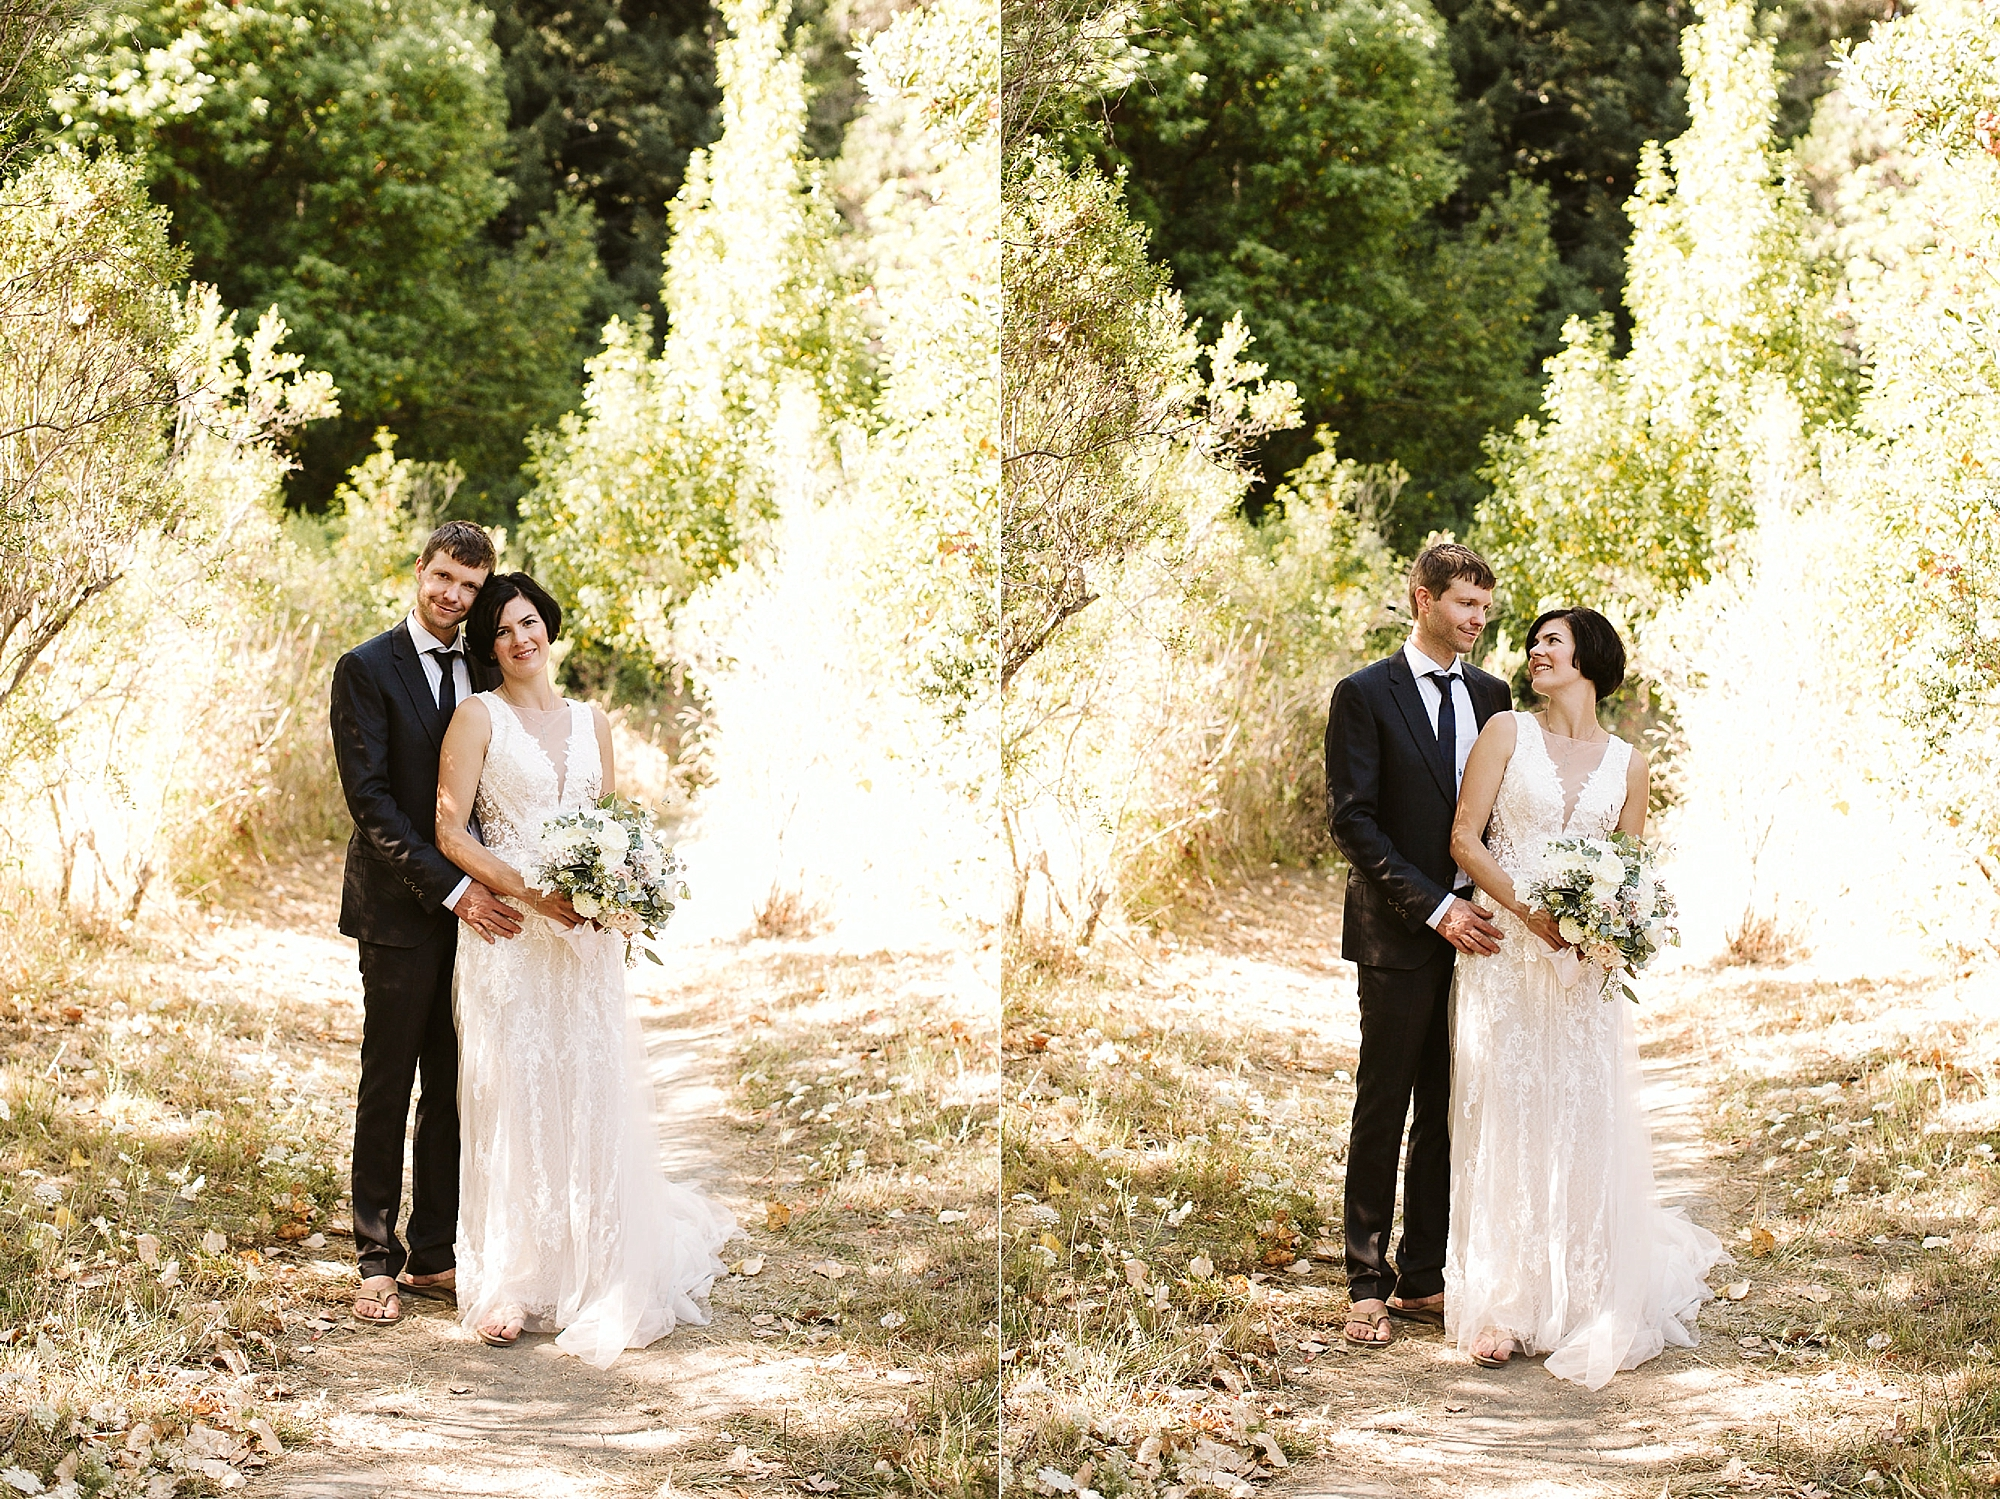 California-wedding-photographer-alfonso-flores-pamplin-groove-268.jpg